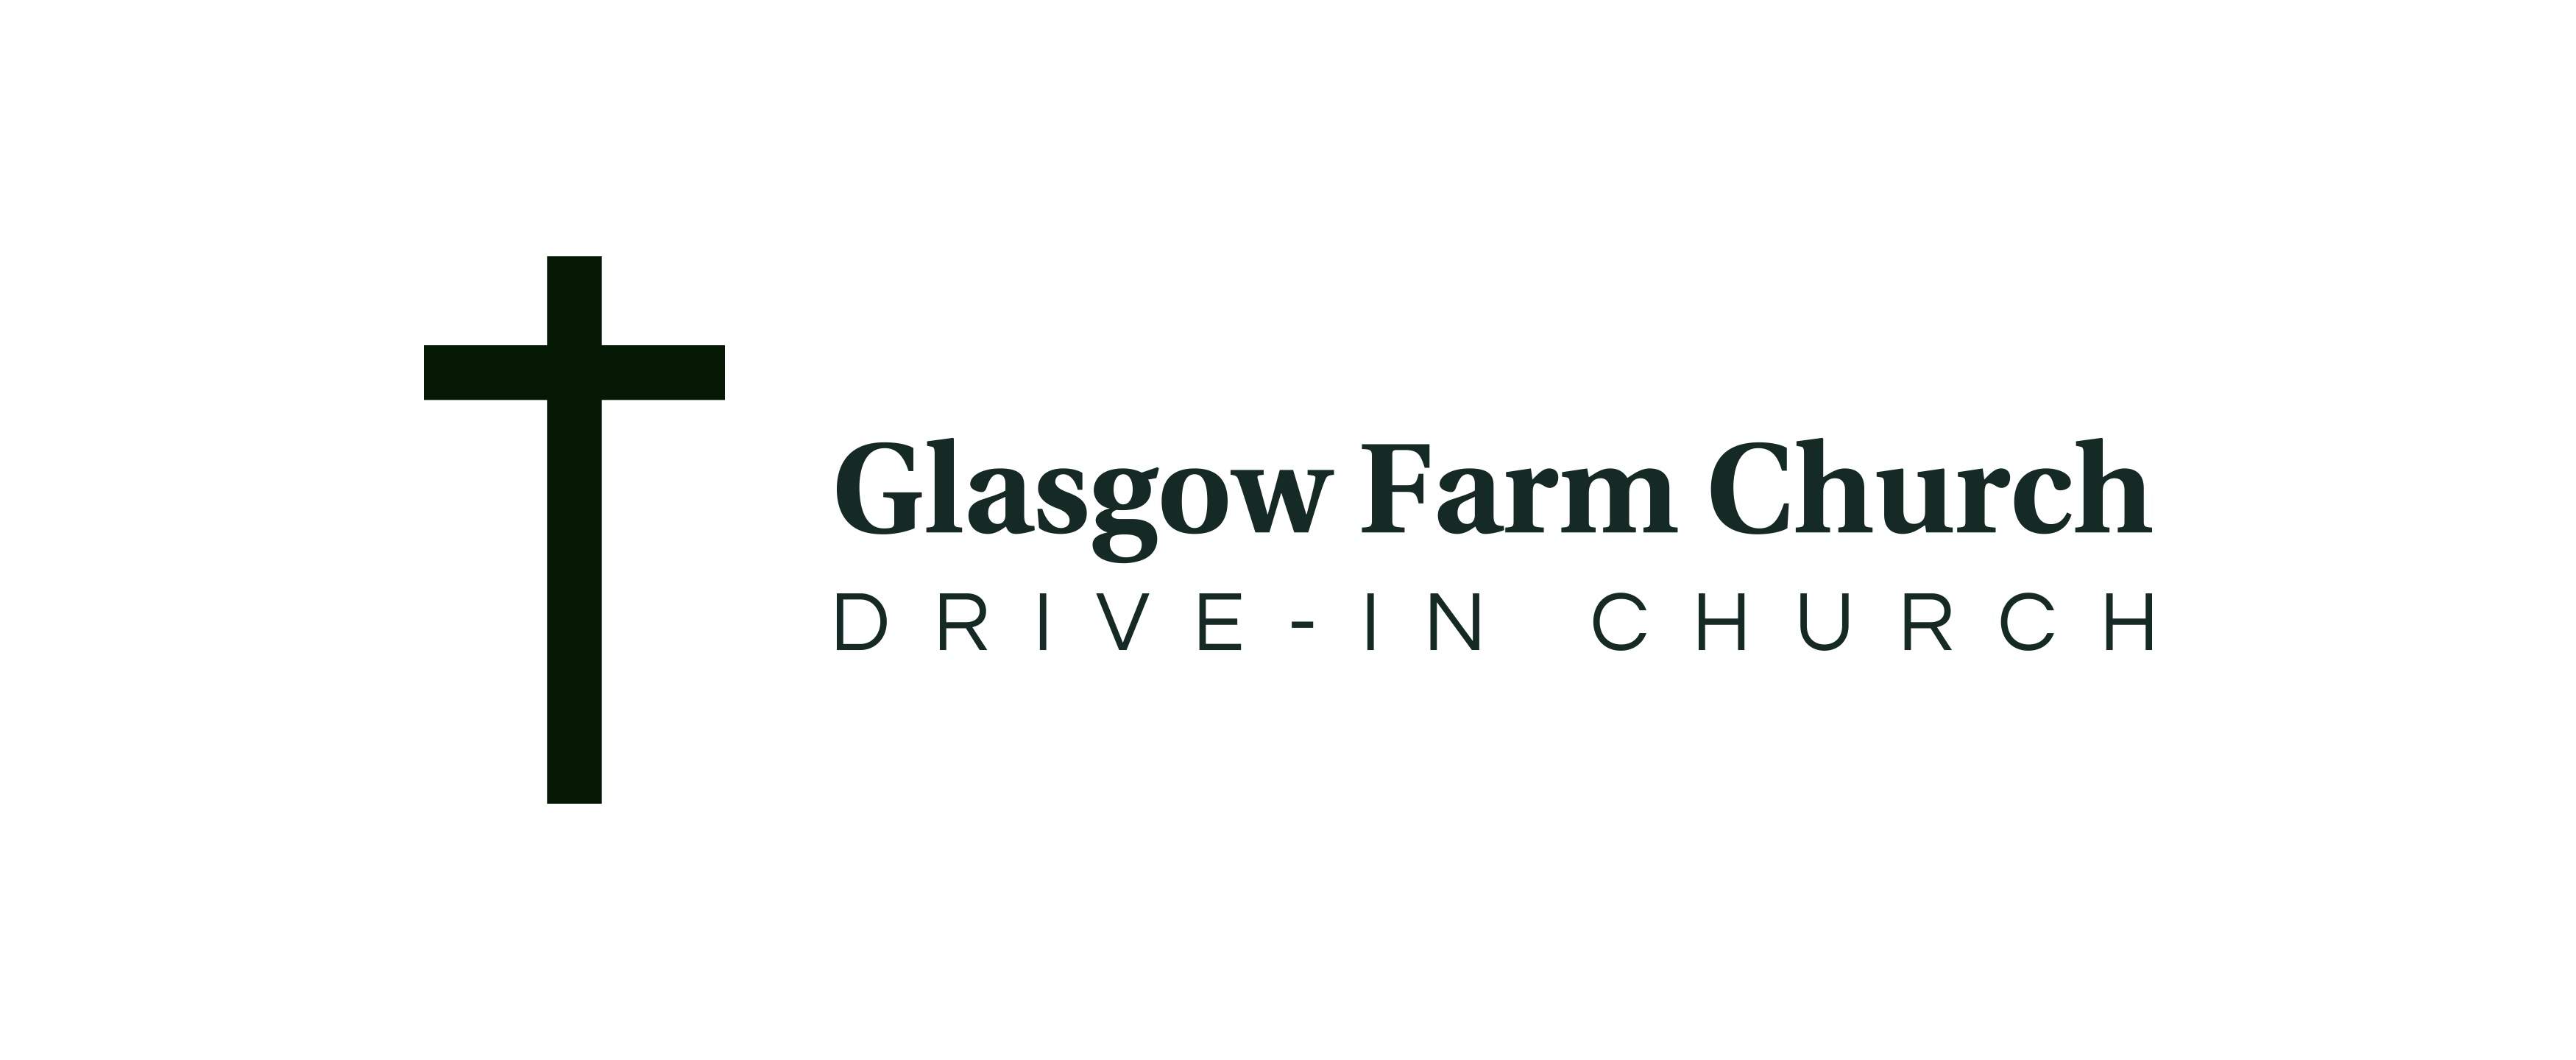 Glasgow Farm Church